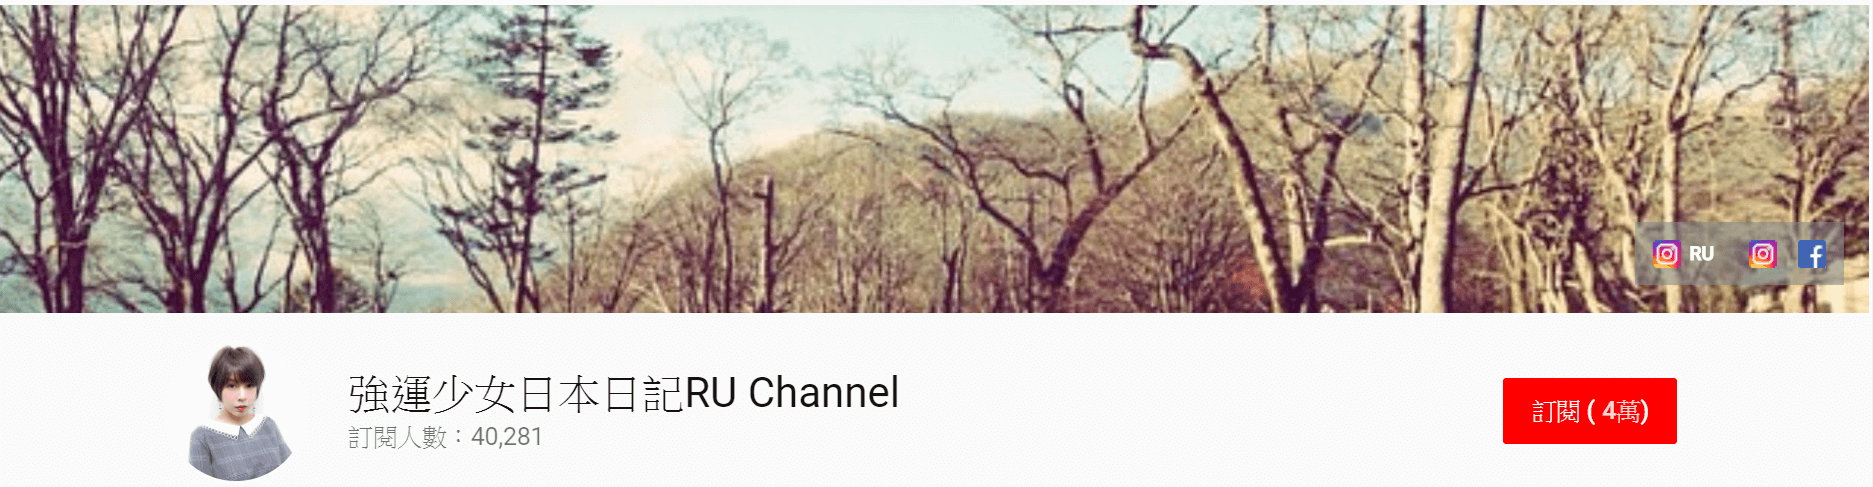 RU Channel